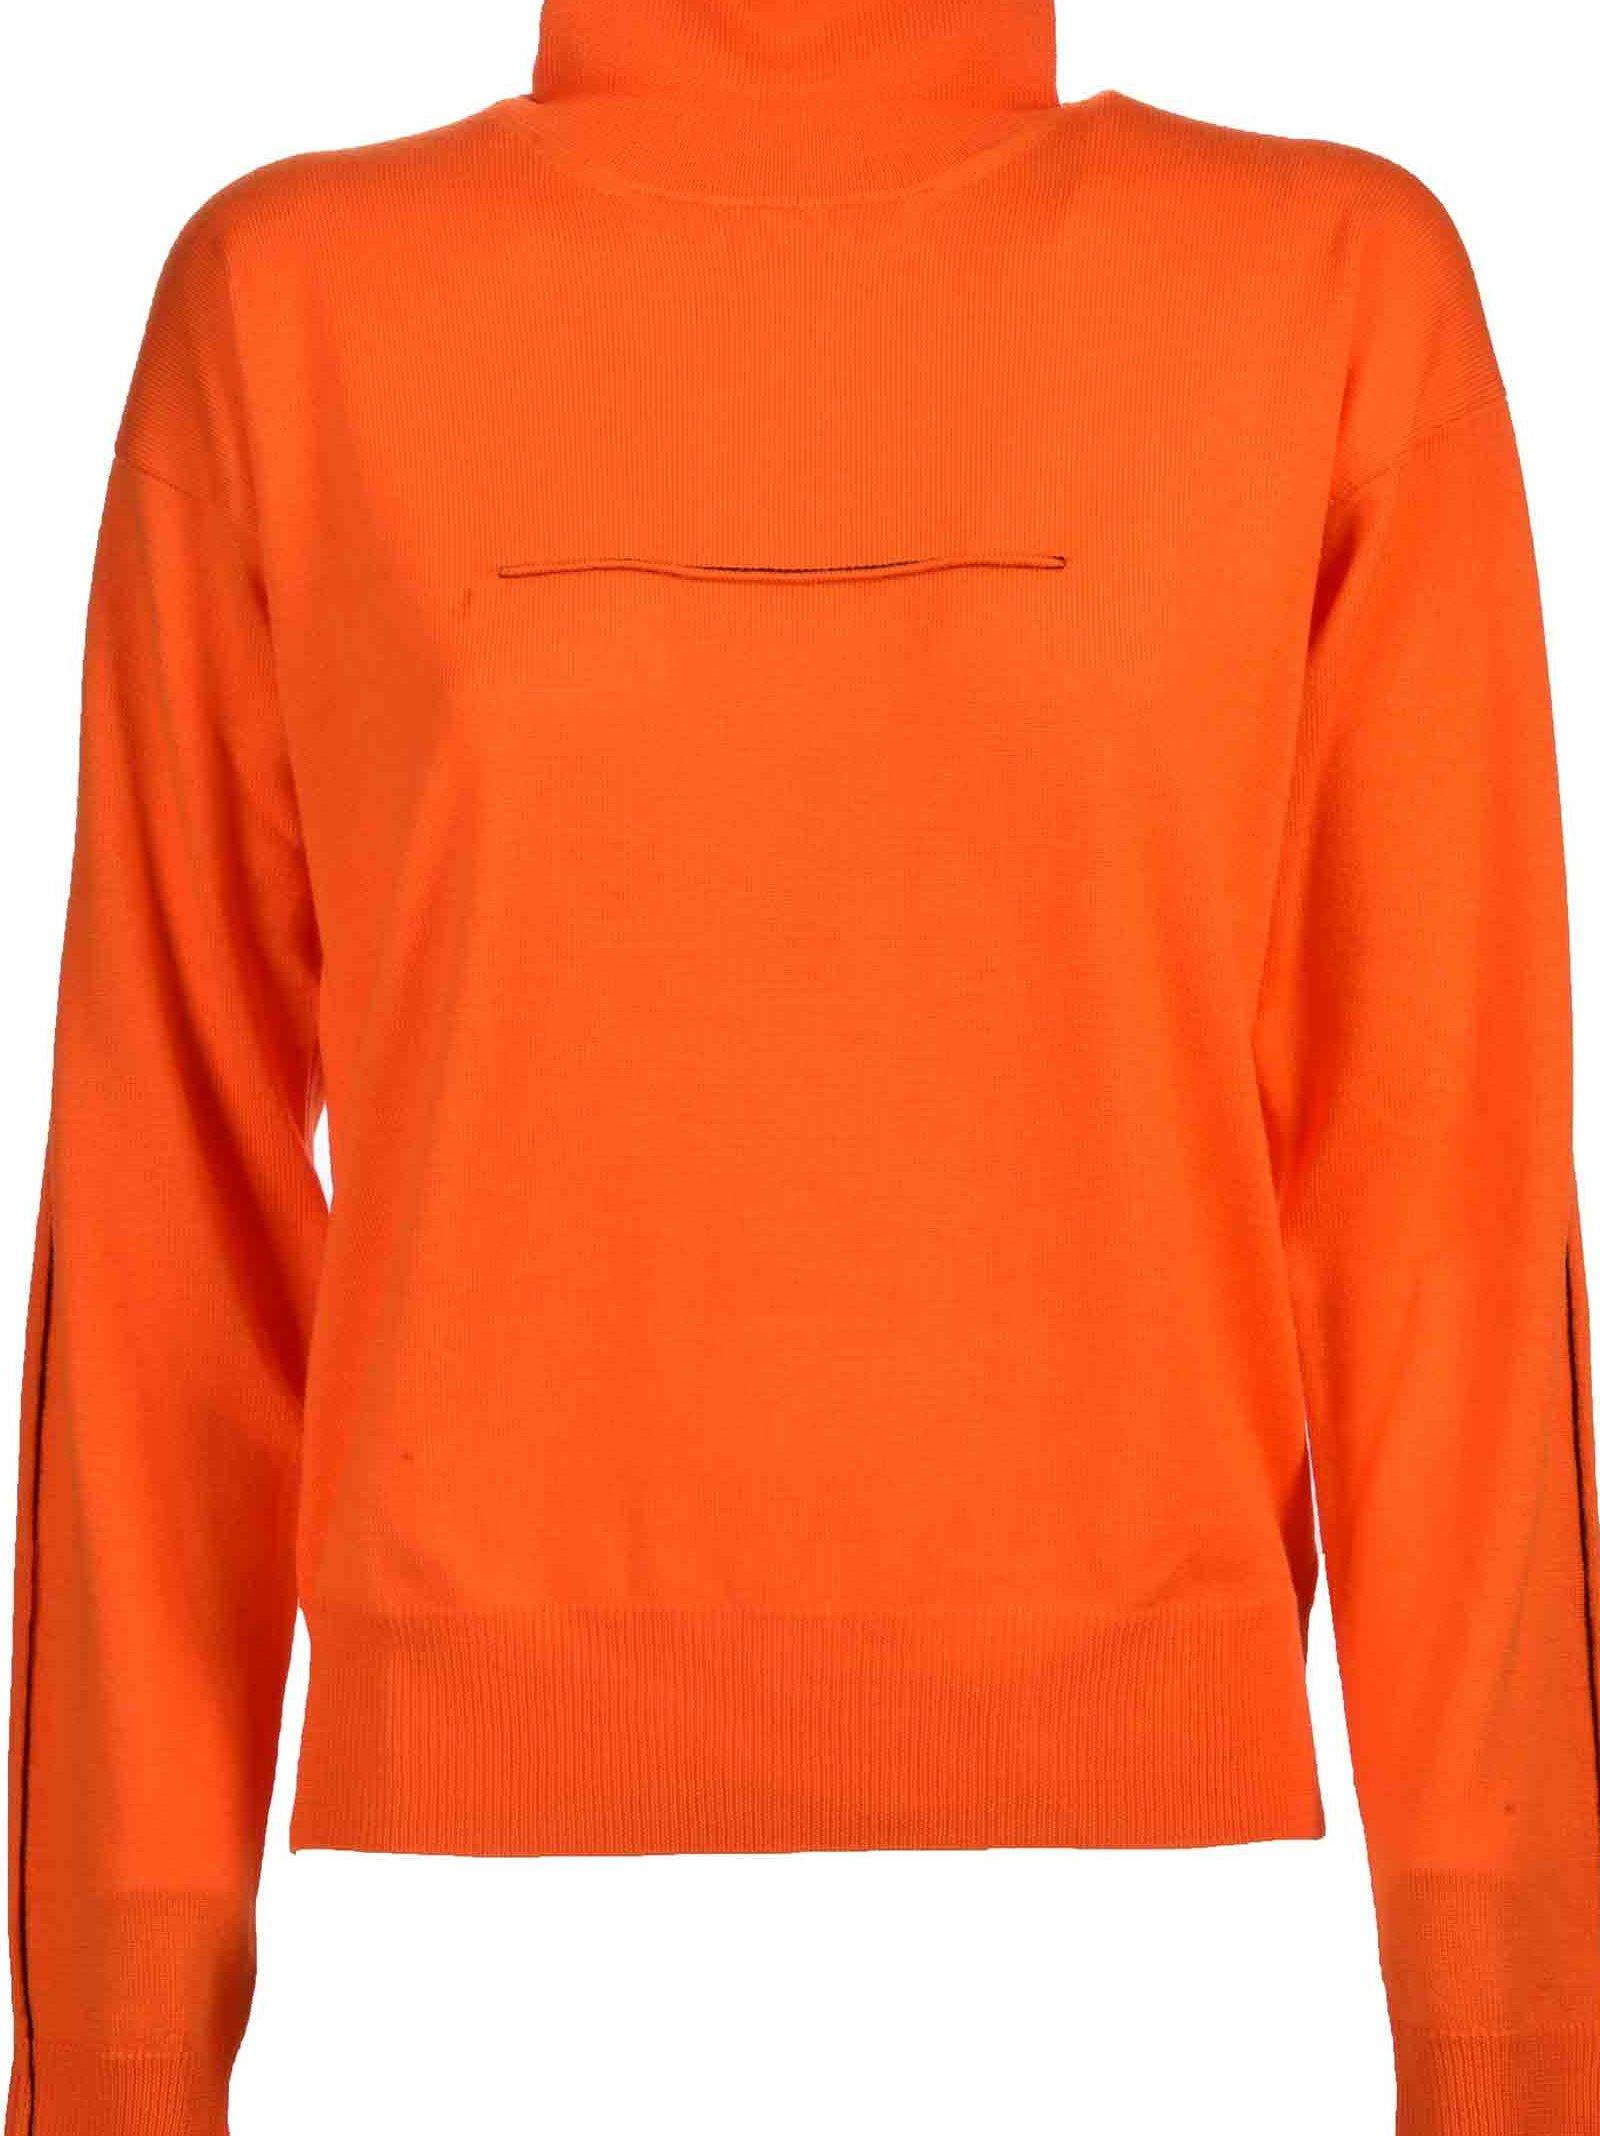 mm6 maison margiela - Mm6 Turtle Neck Sweater